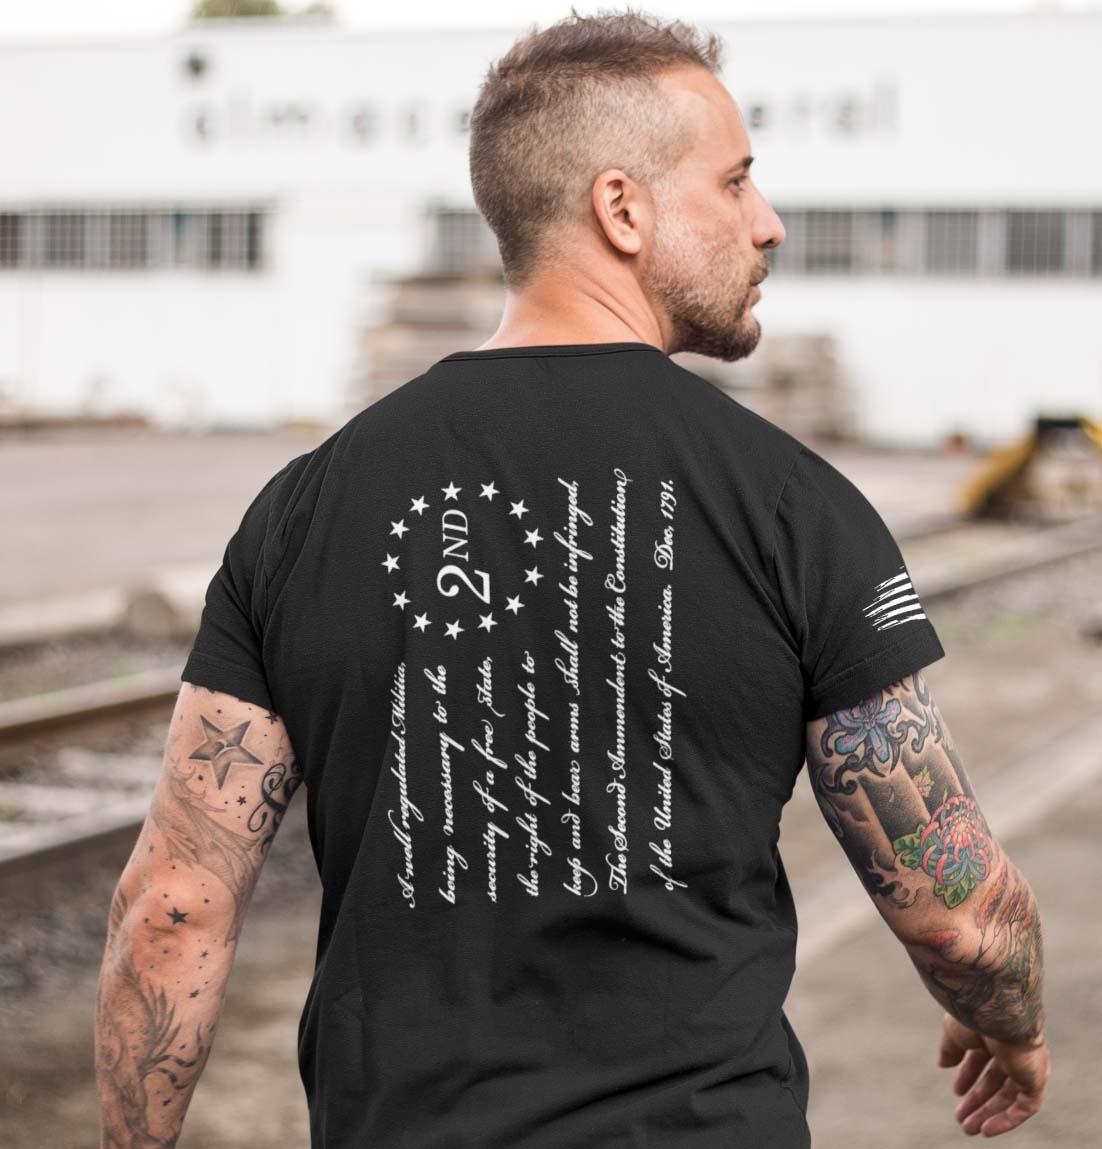 t-shirt - 2nd amendment on back - men's - black